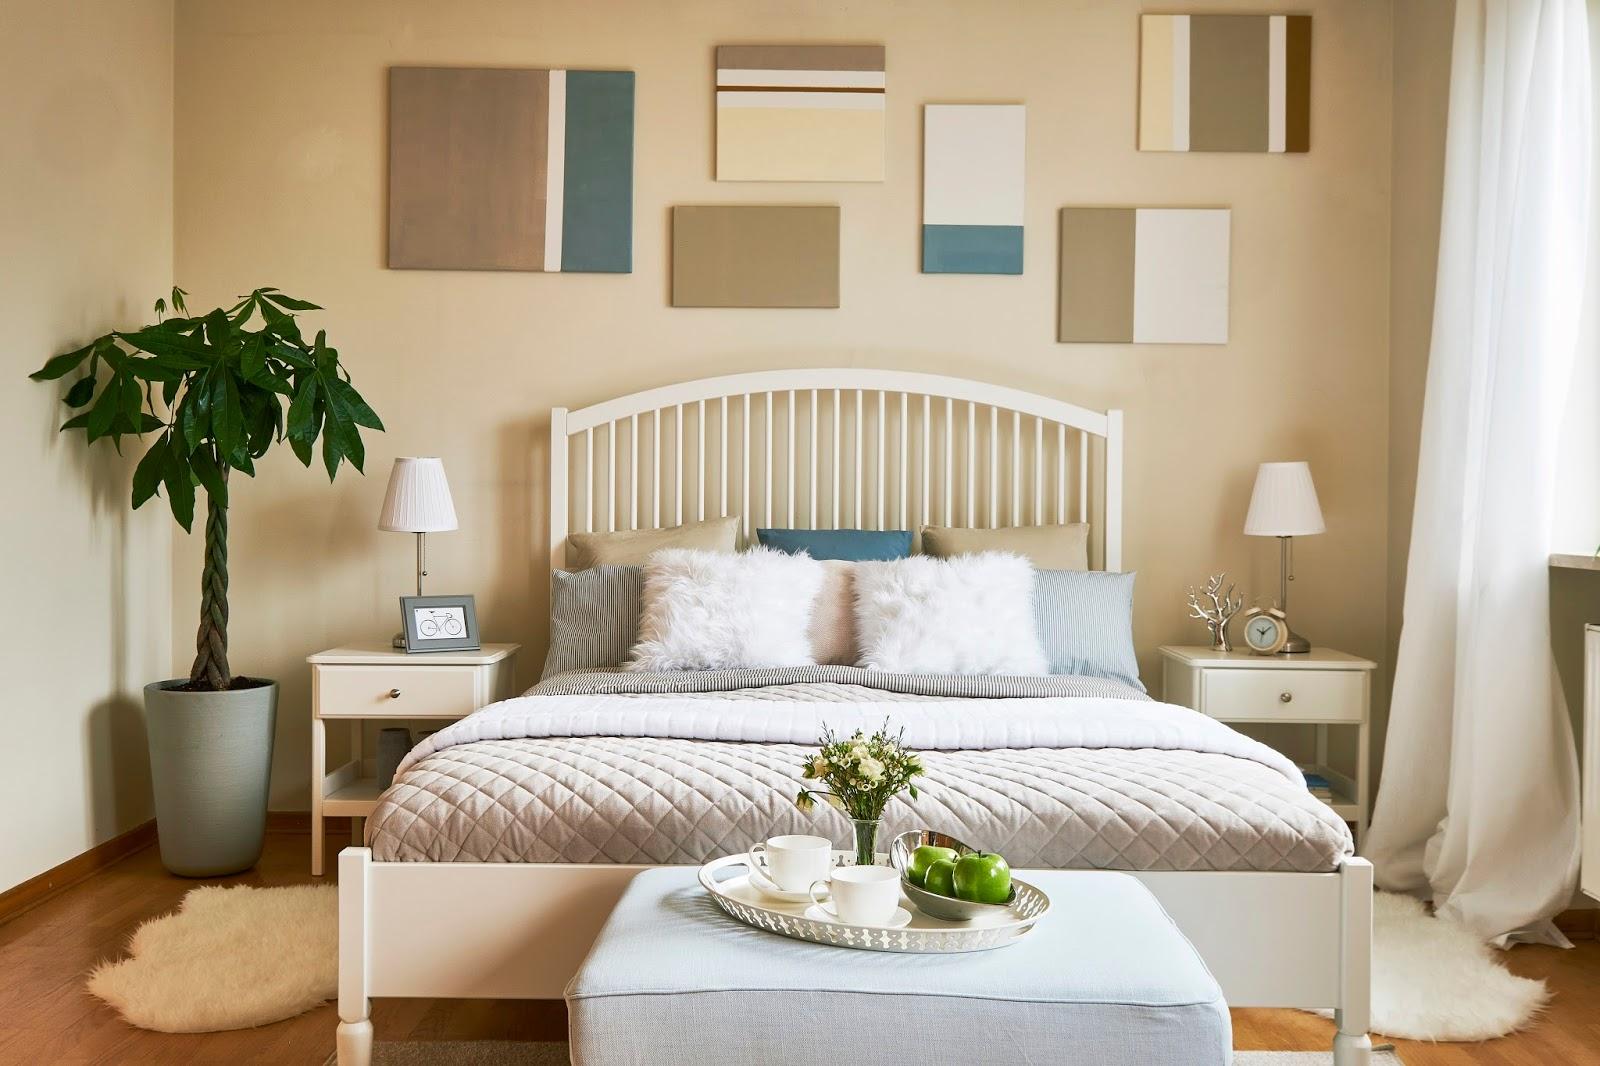 Zaawansowany kurs home stagingu - metamorfoza sypialni